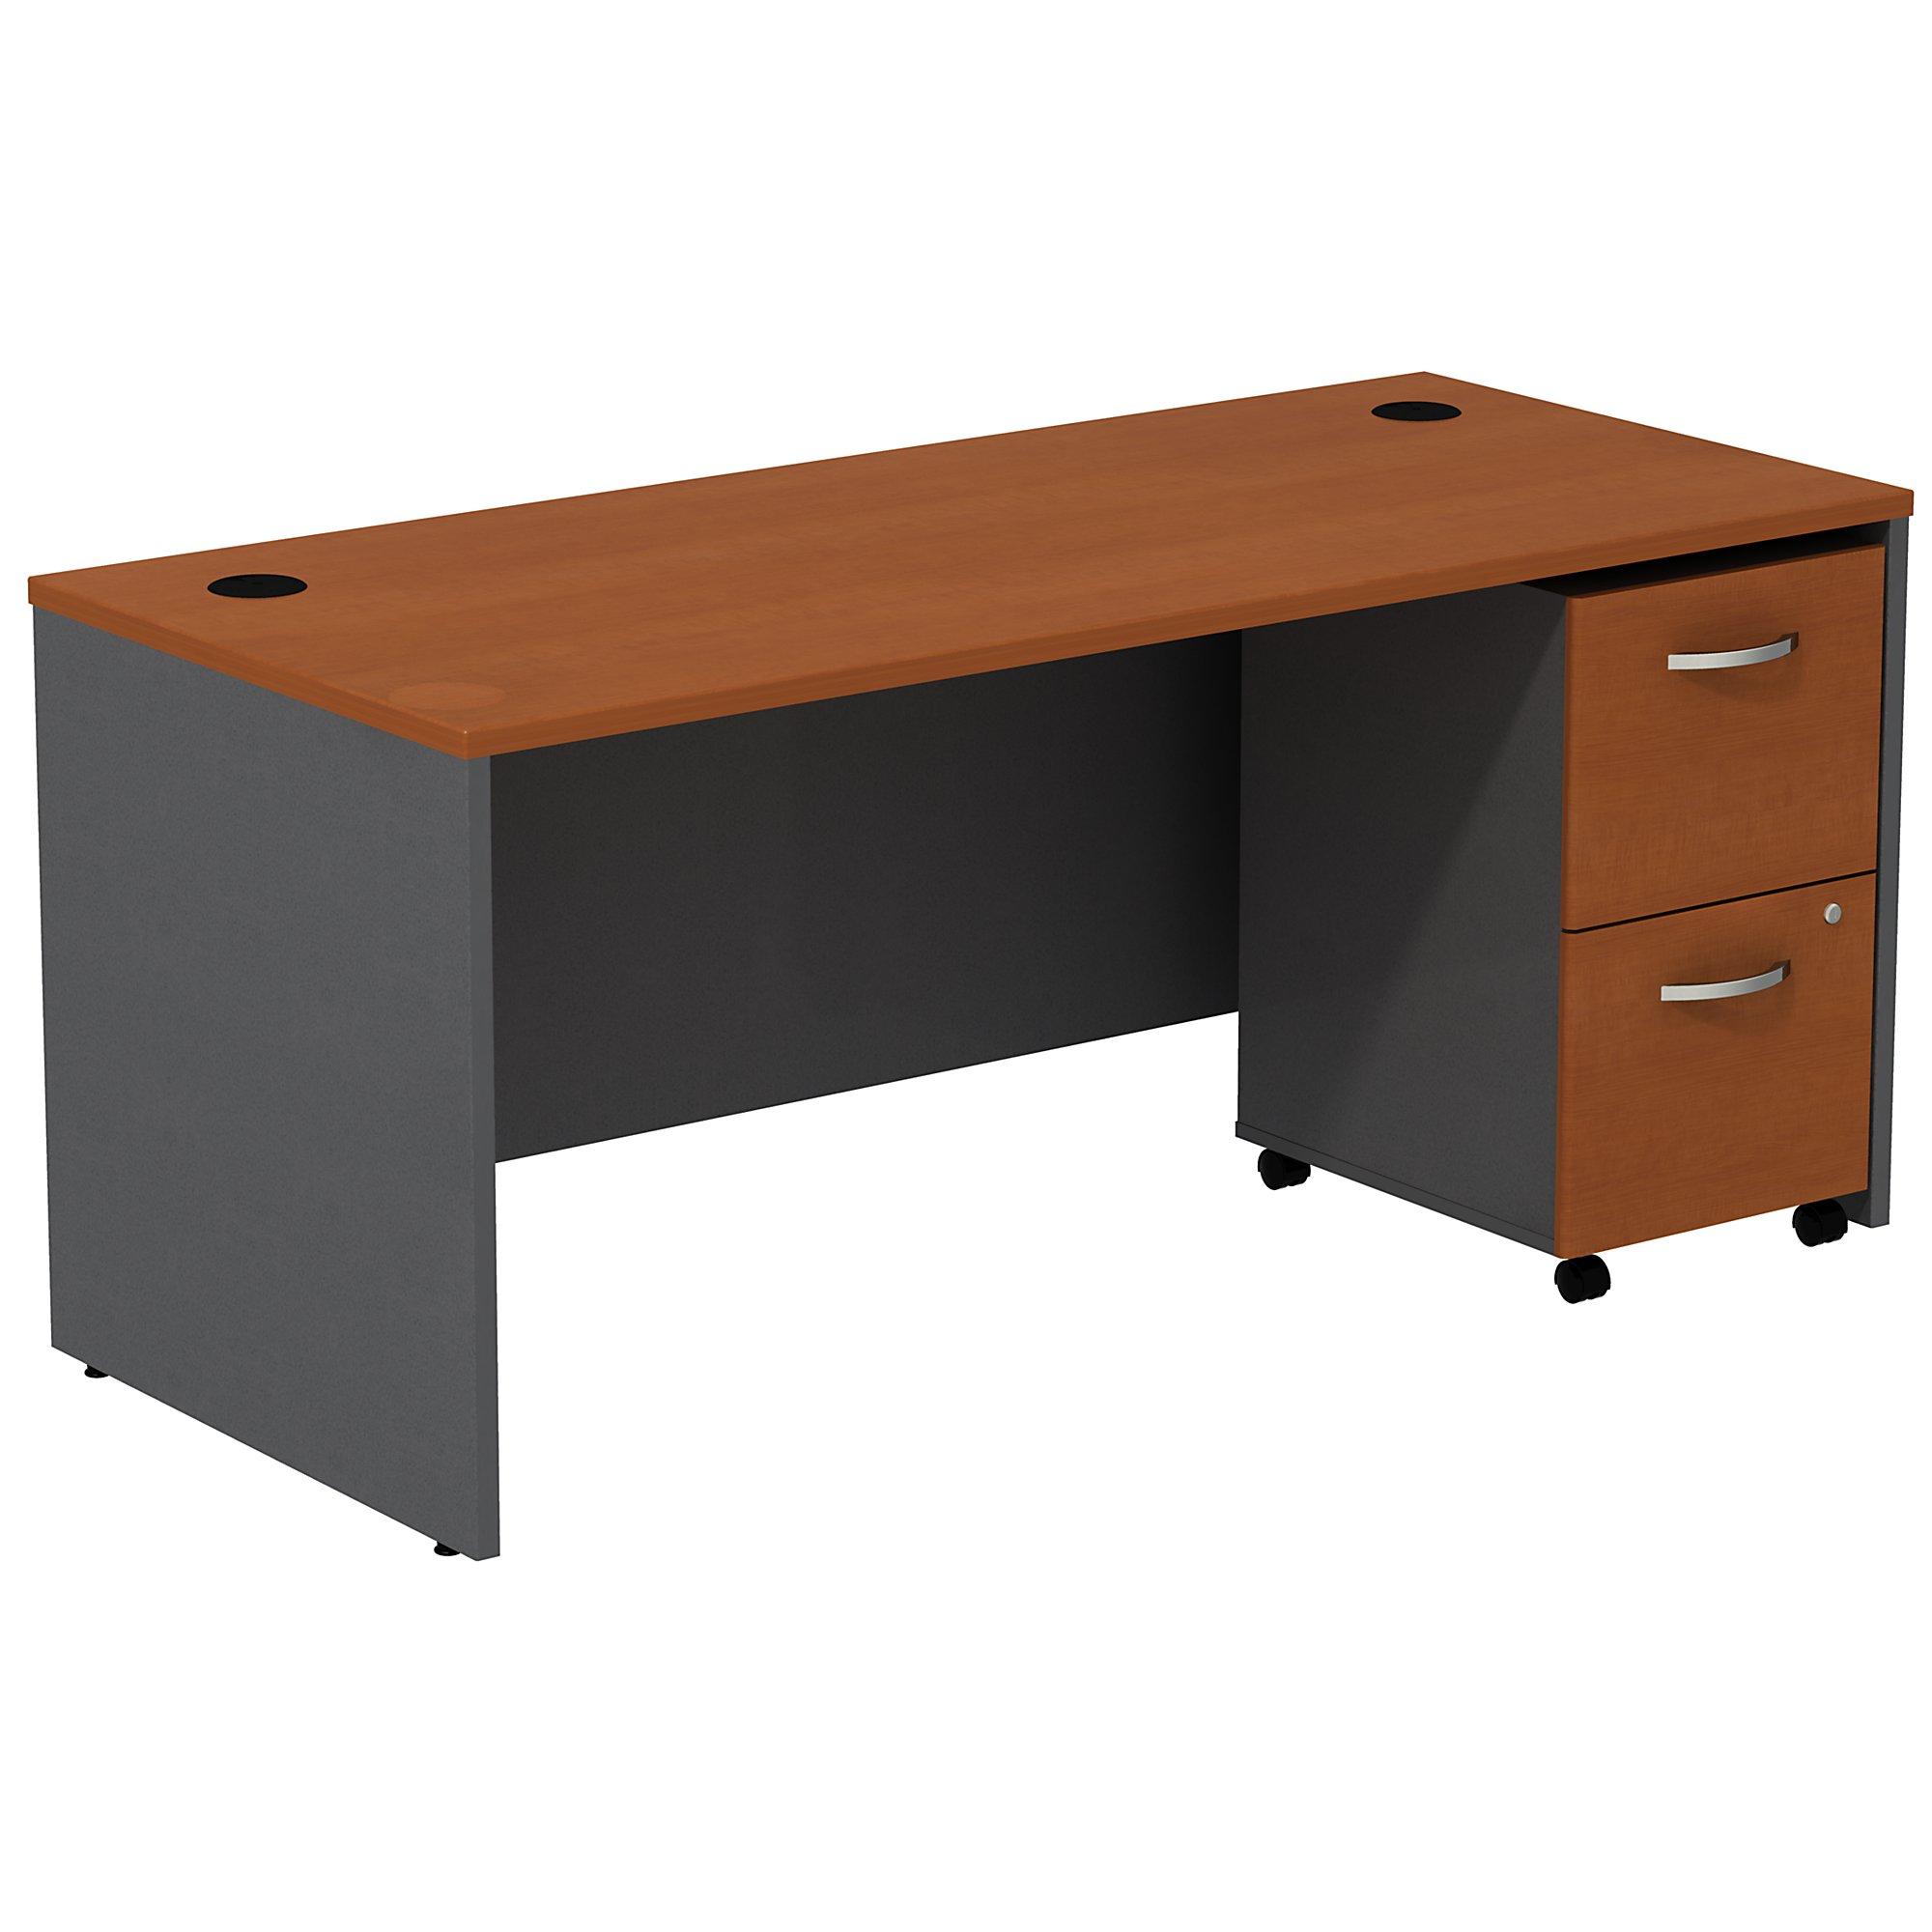 auburn maple series c desk with mobile pedestal